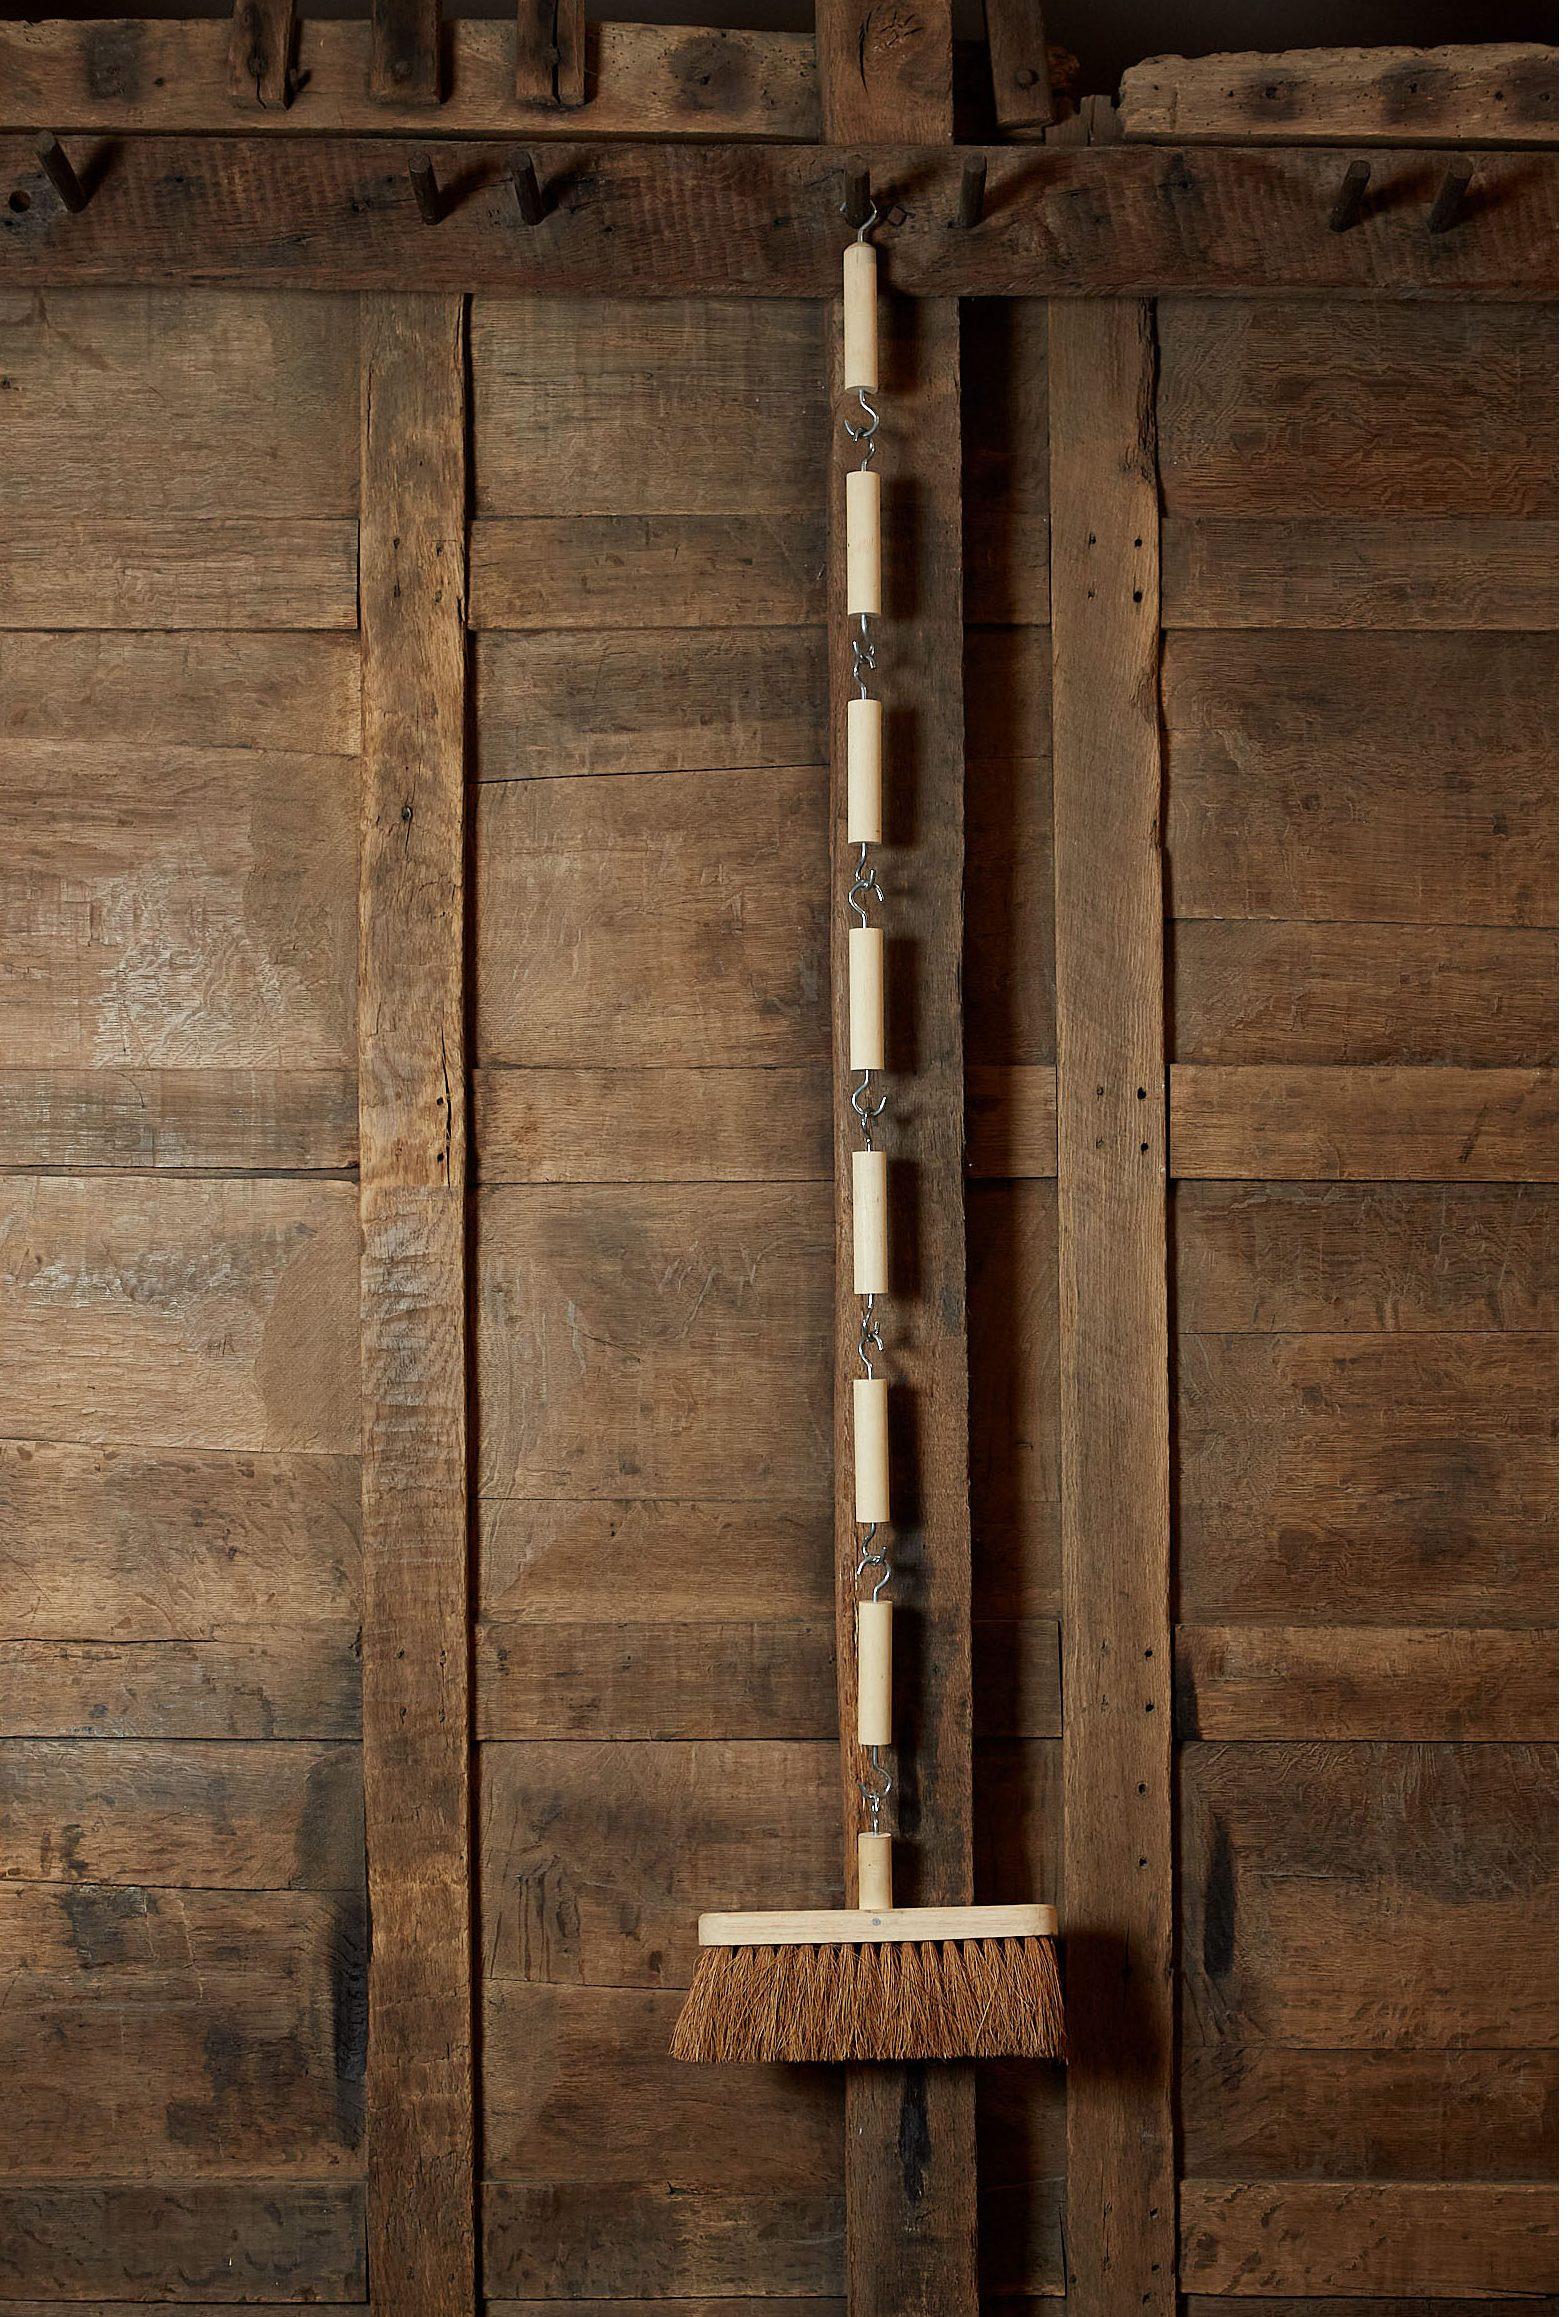 Broom-4894